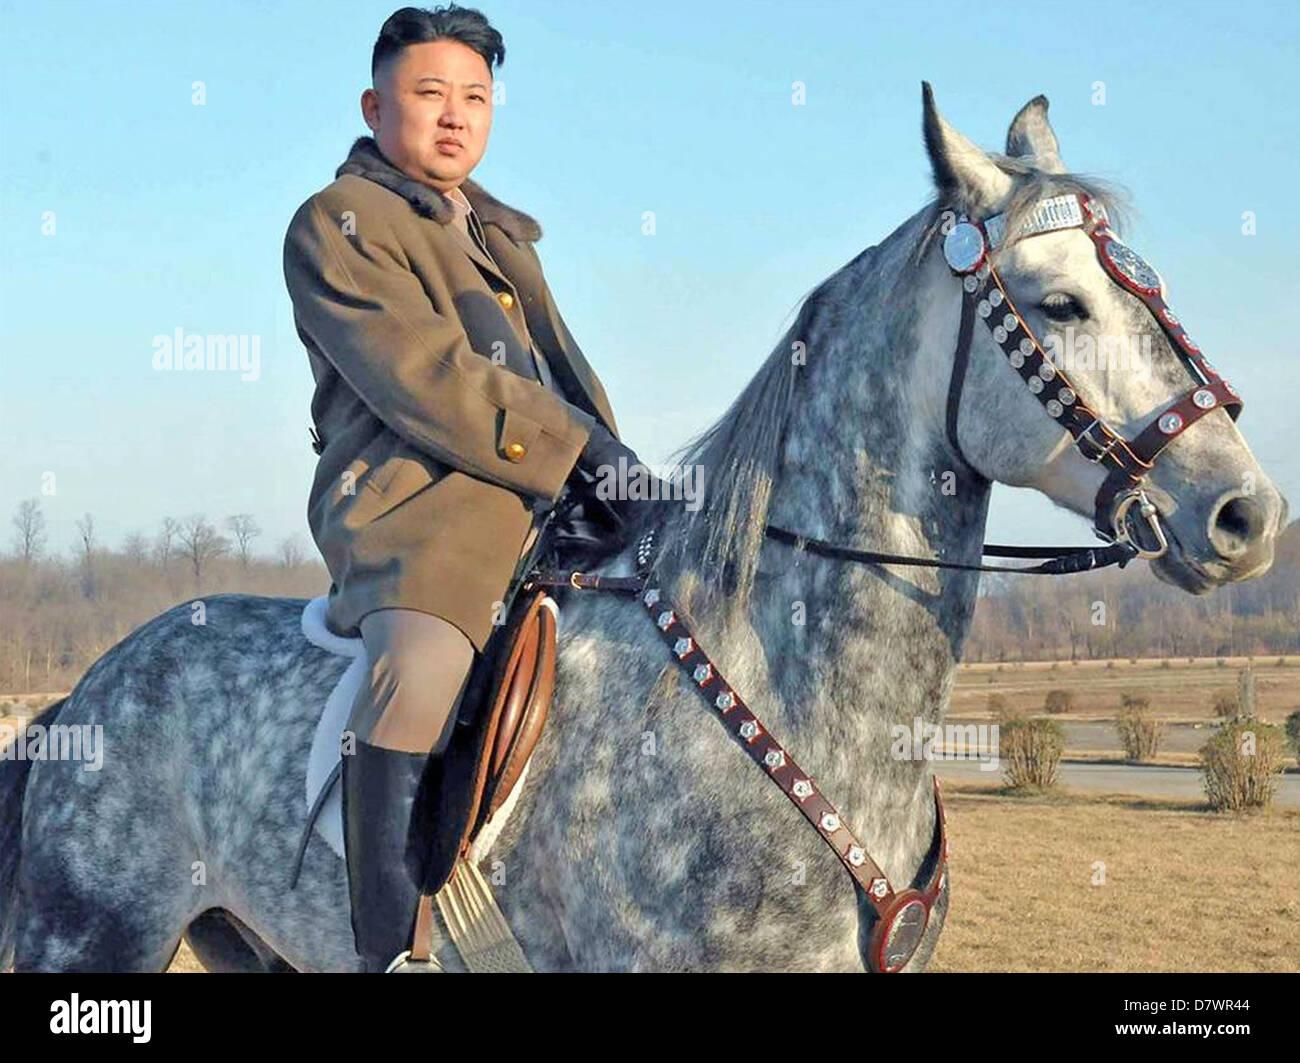 KIM JONG-un  Supreme leader of North Korea in 2013 - Stock Image